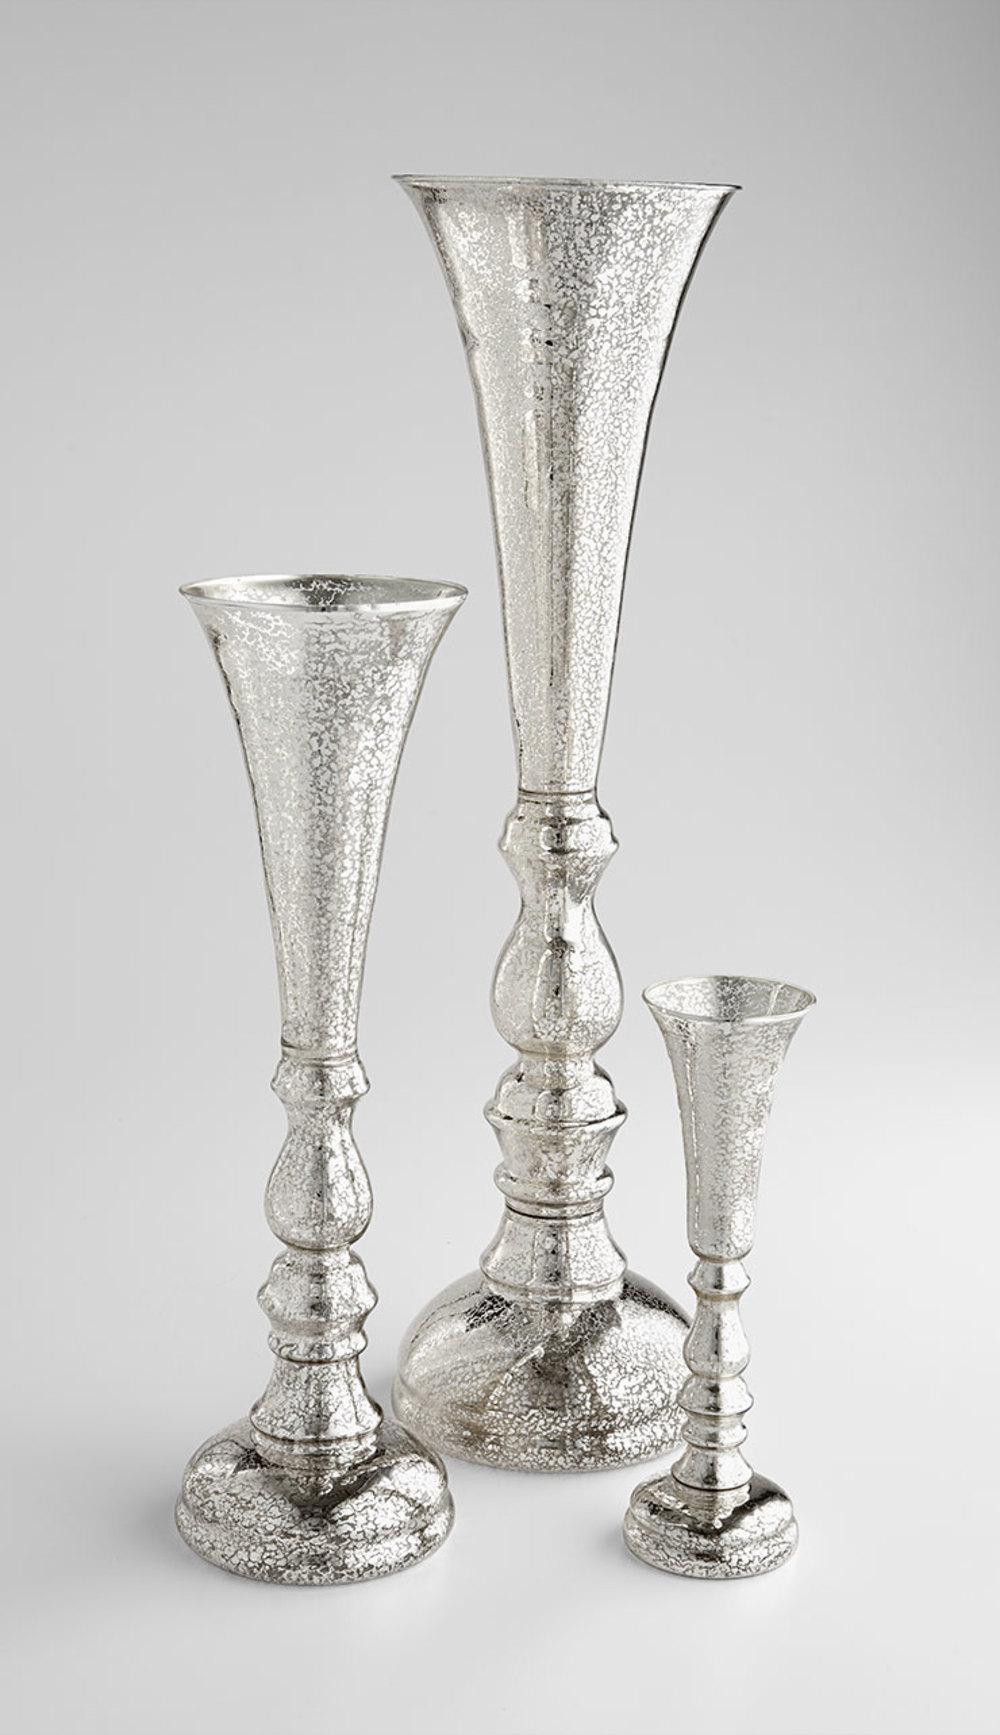 Cyan Designs - Small Shimer Vase